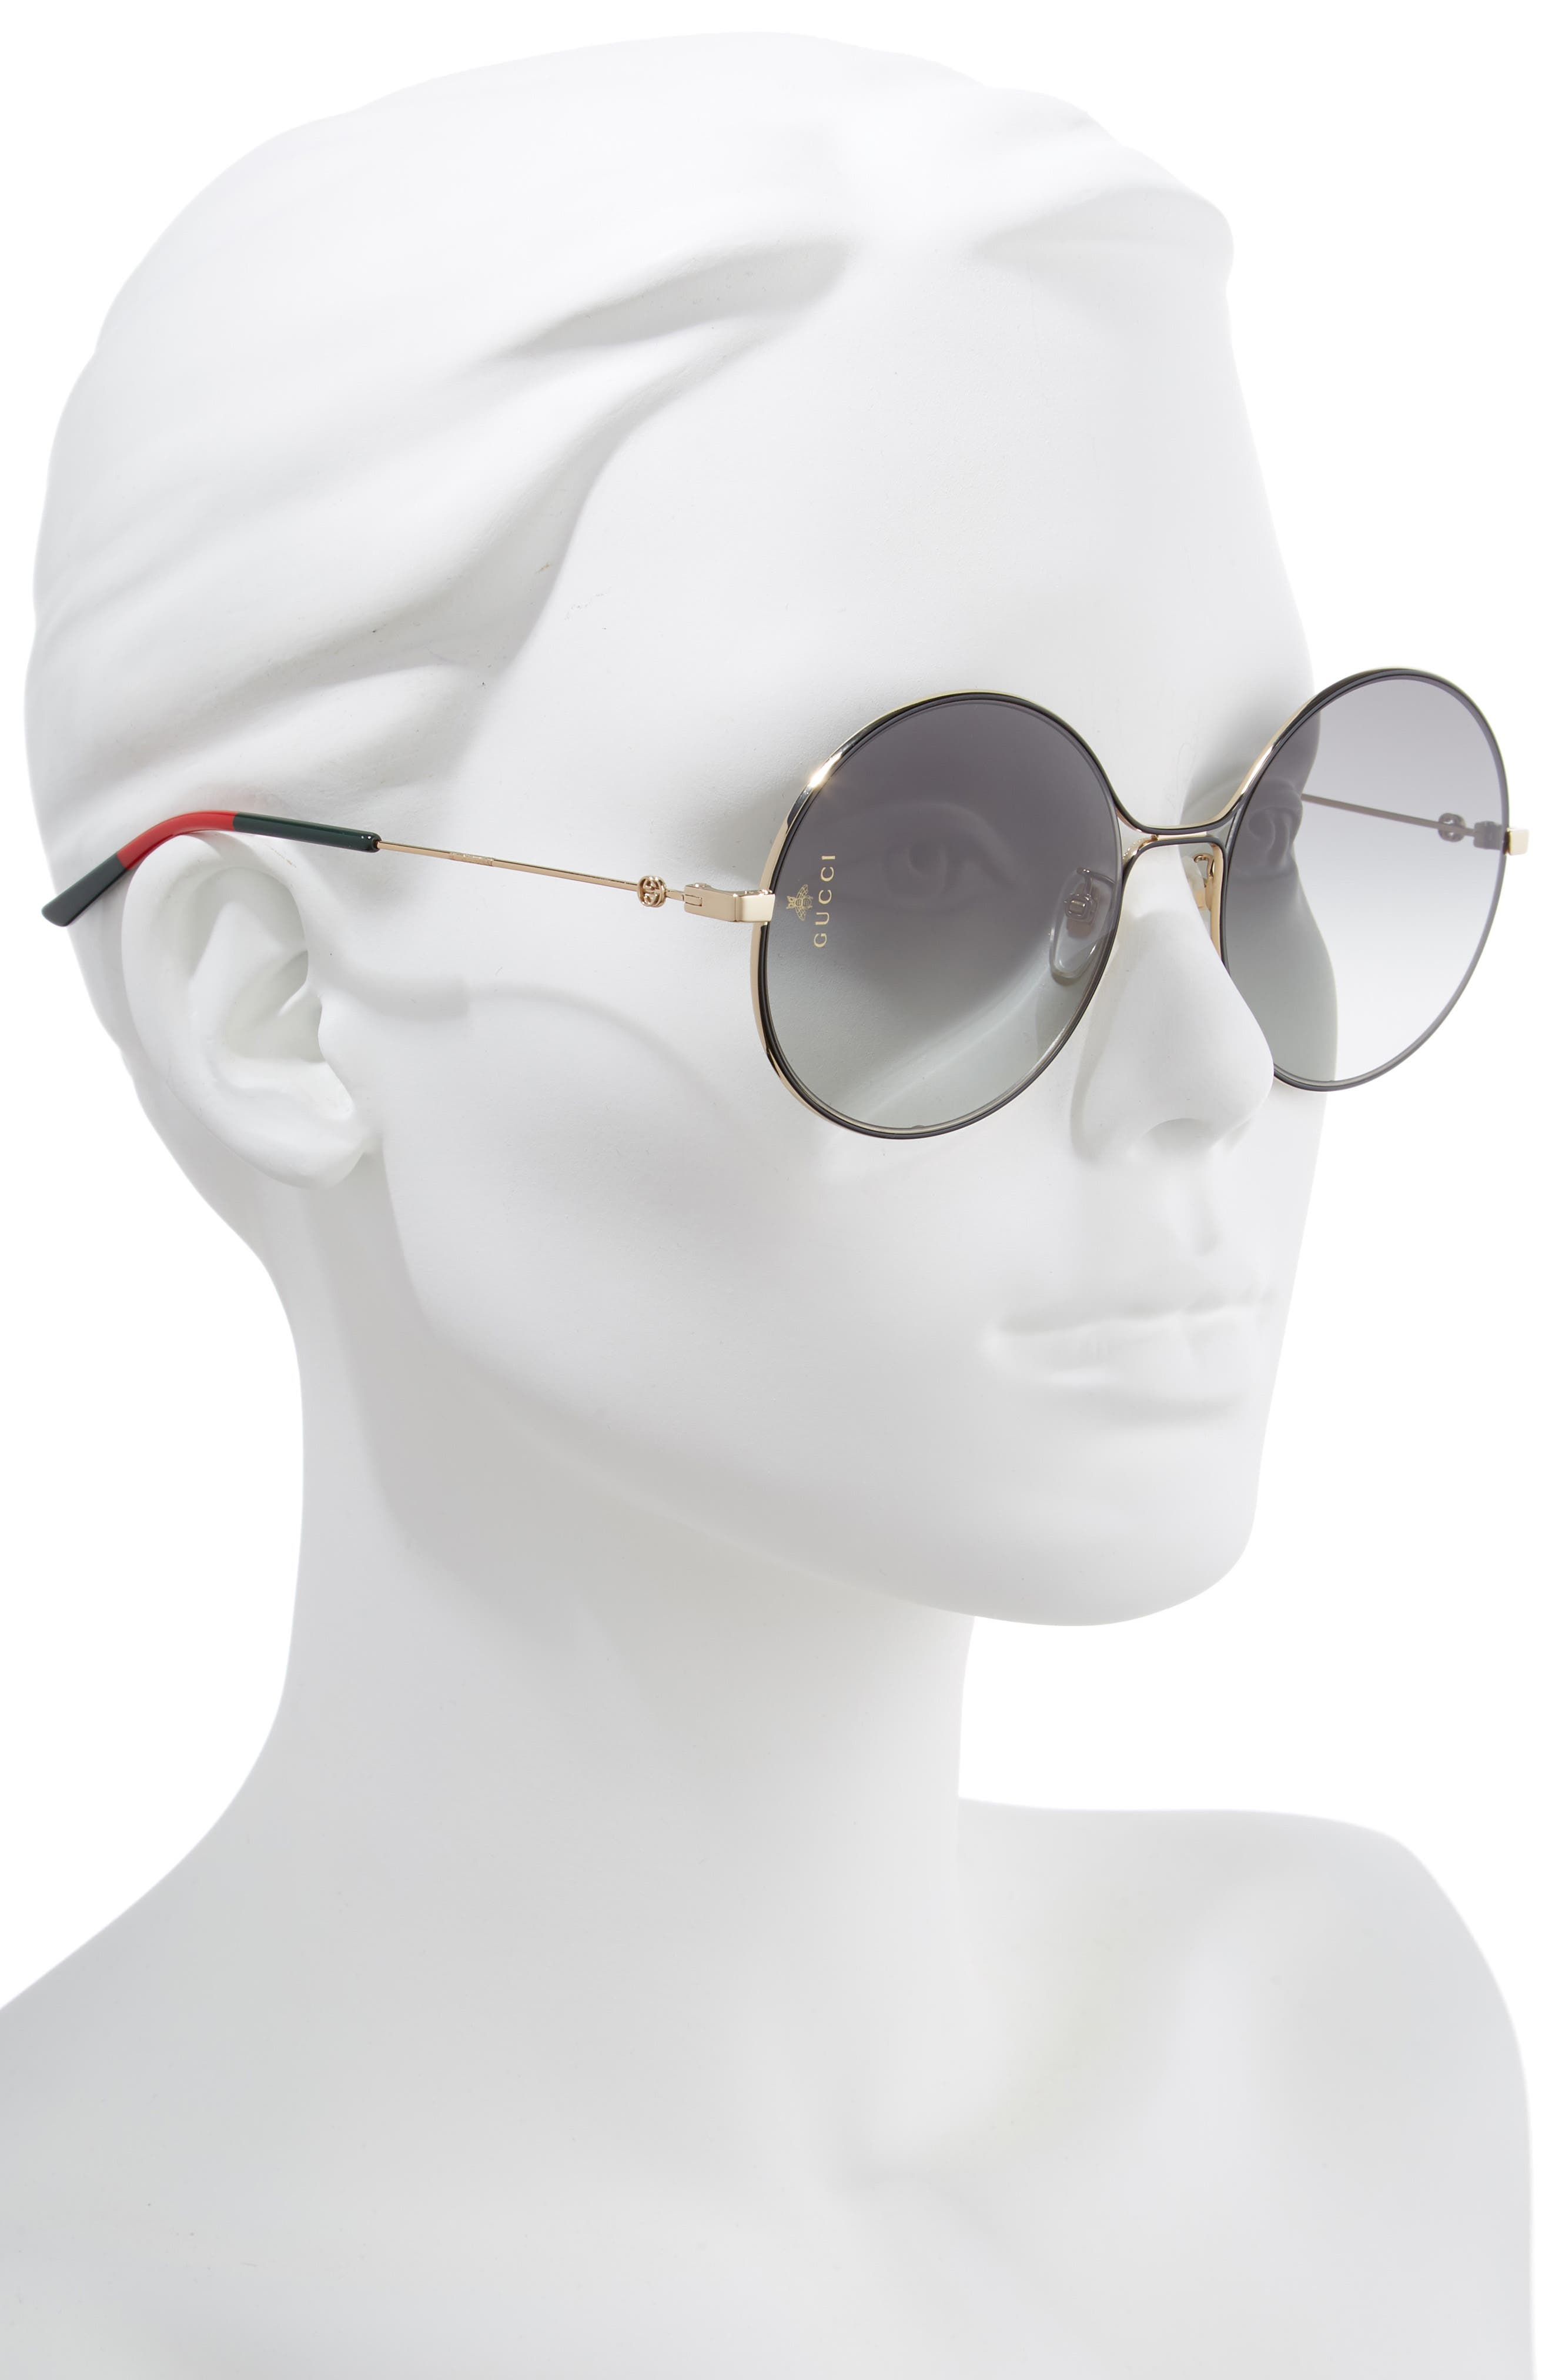 58mm Round Sunglasses,                             Alternate thumbnail 2, color,                             GOLD/ BLACK/ GREY GRADIENT